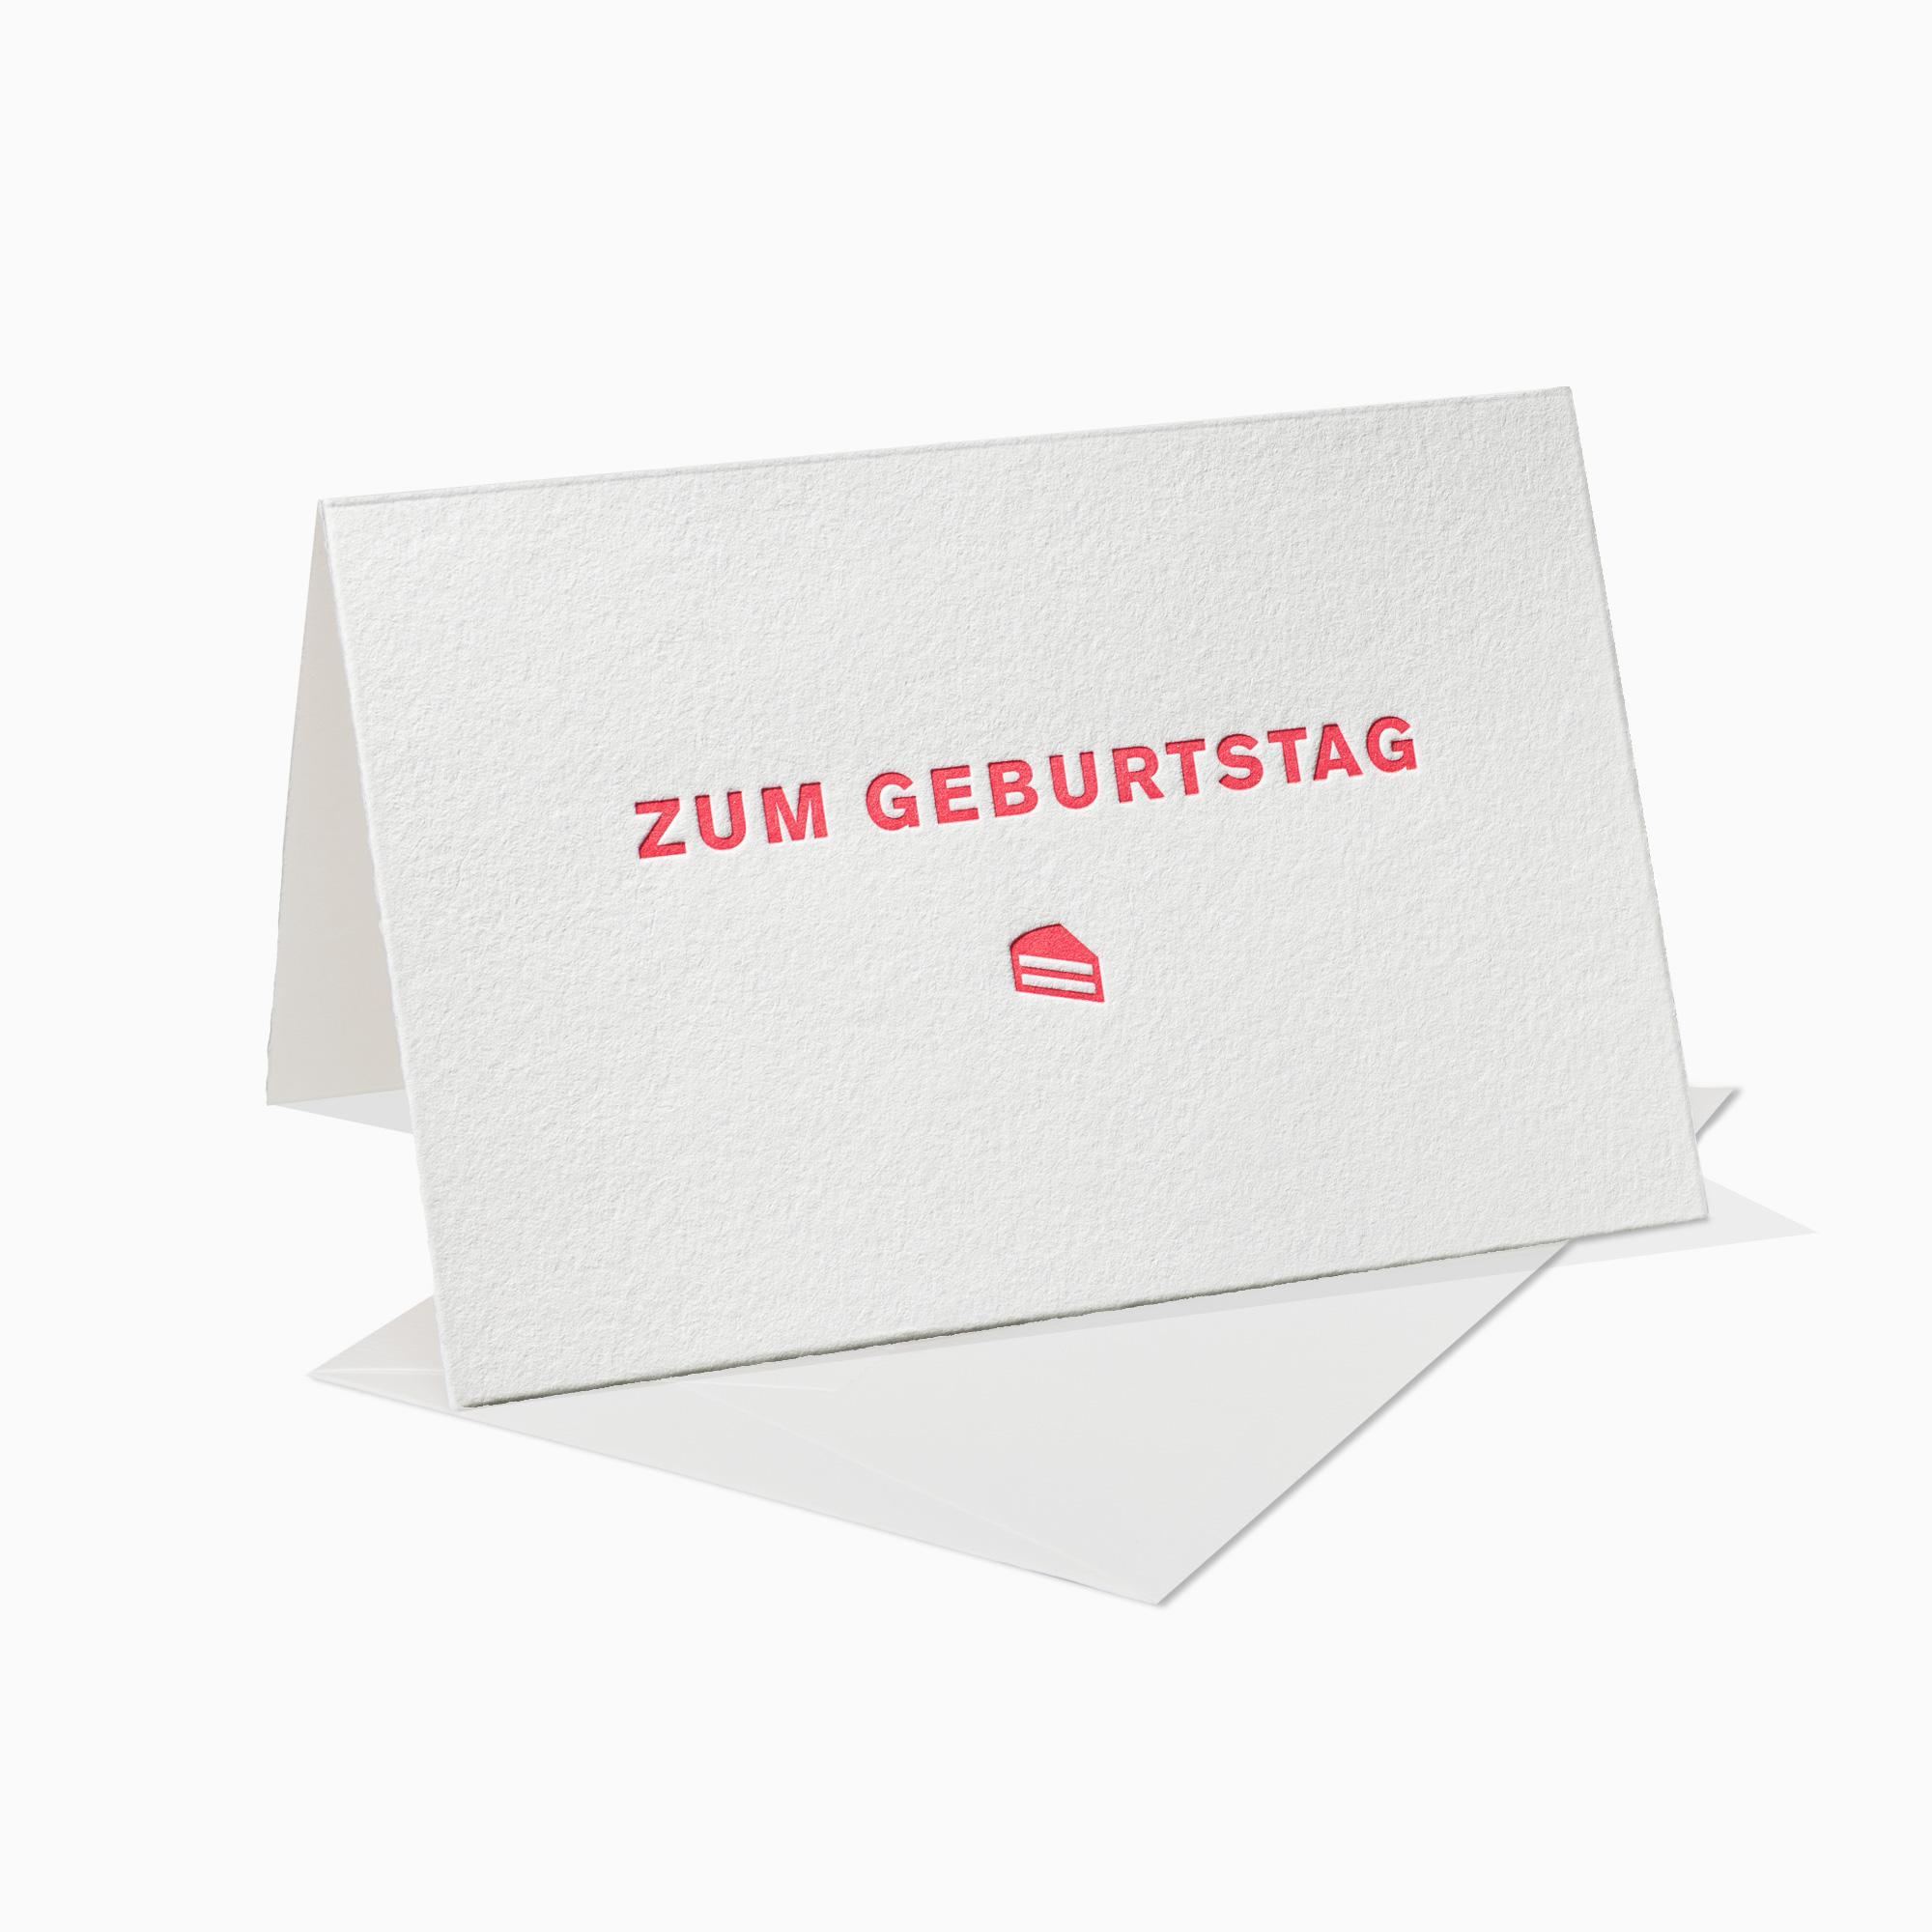 Geburtstag   Letterpress Karten   Paul Dieter Letterpress